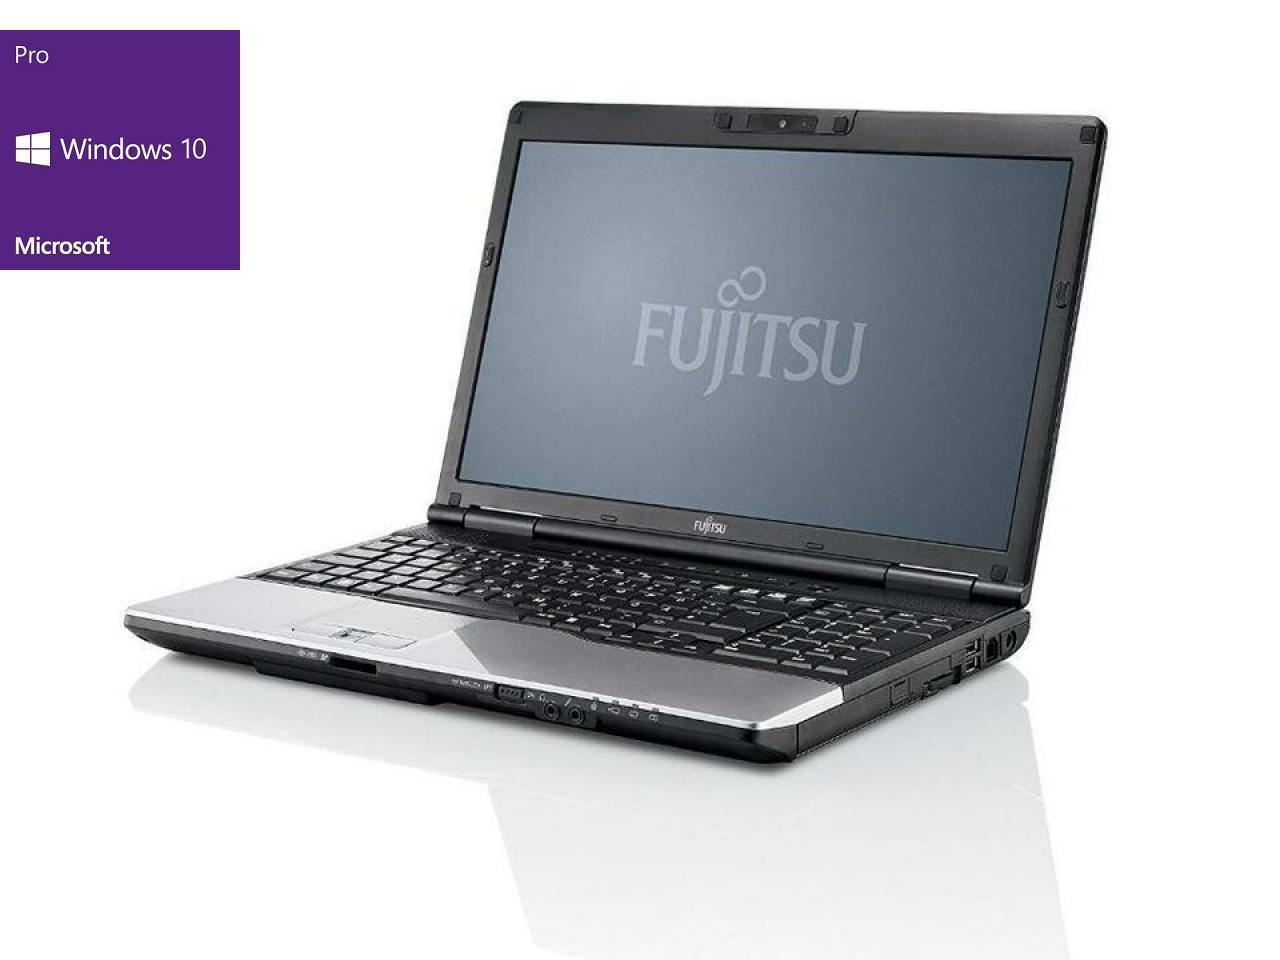 Fujitsu LIFEBOOK E752 (Schwarze Tastatur mit Numblock)